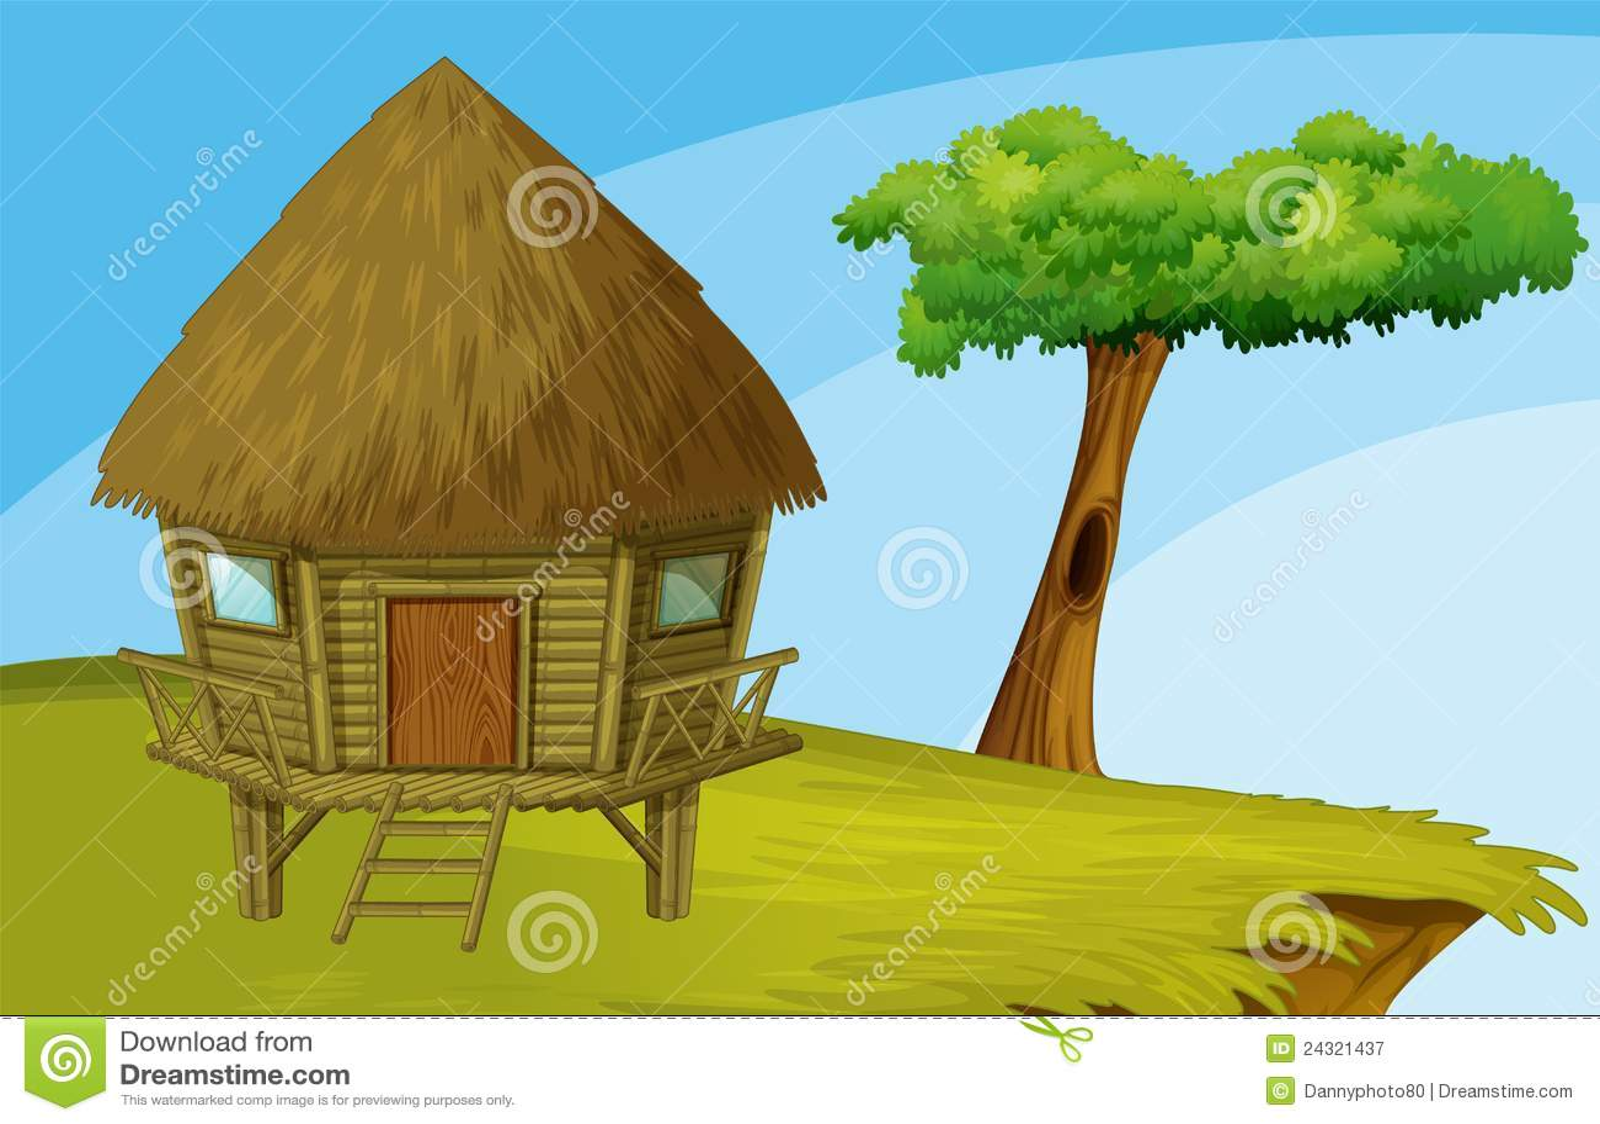 Bahay Kubo Design Cartoon Hut Royalty Free Stock Photography Image 24321437